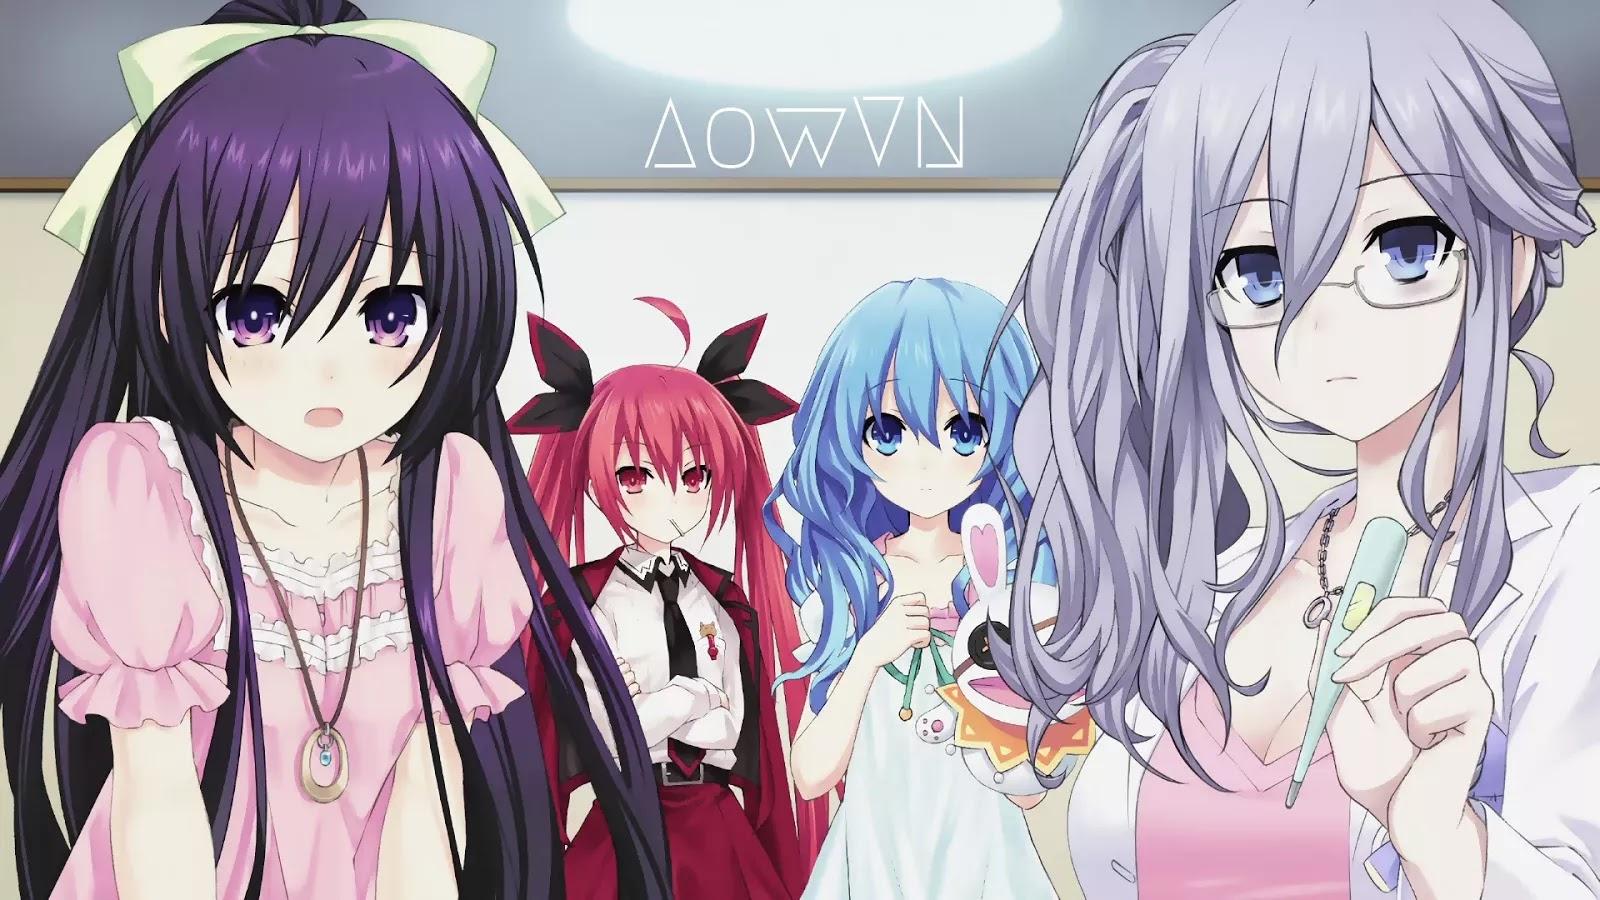 AowVN.org min%2B%25283%2529 - [ Anime 3gp Mp4 ] Date a live SS1 + SS2 + OVA + Movie | Vietsub - Harem Hay